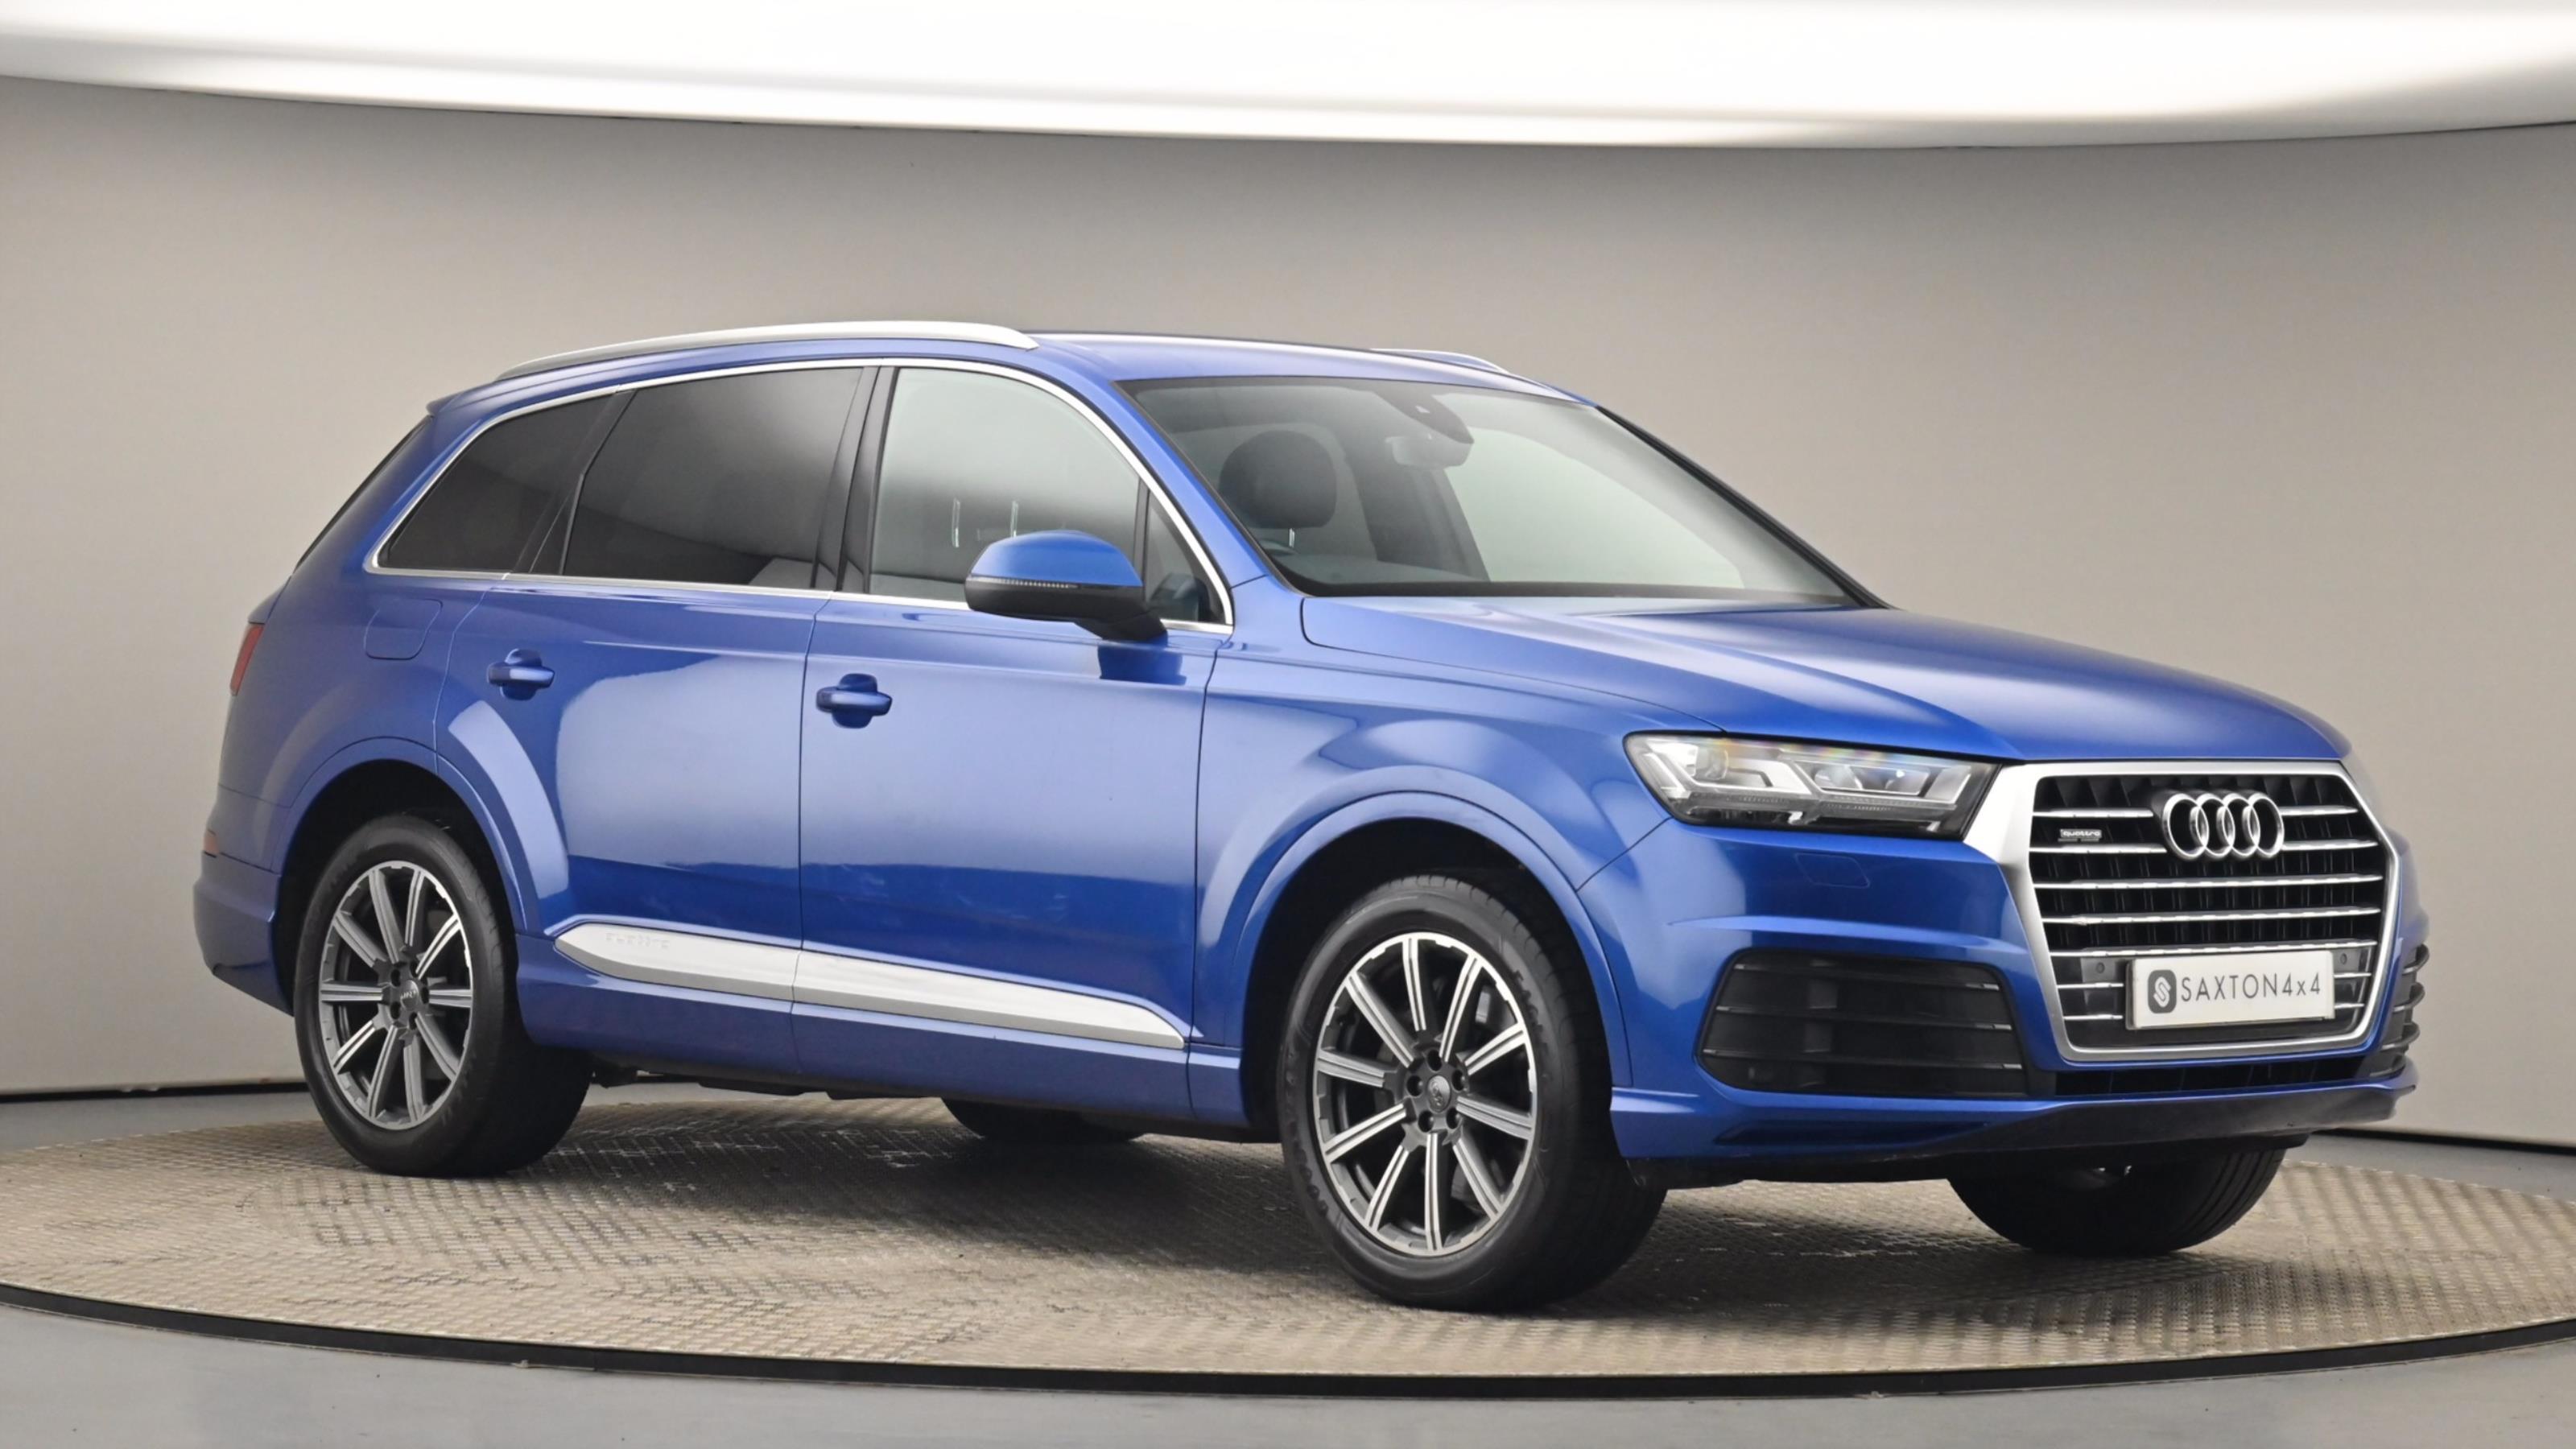 Used 2016 Audi Q7 3.0 TDI 218 Quattro S Line 5dr Tip Auto BLUE at Saxton4x4